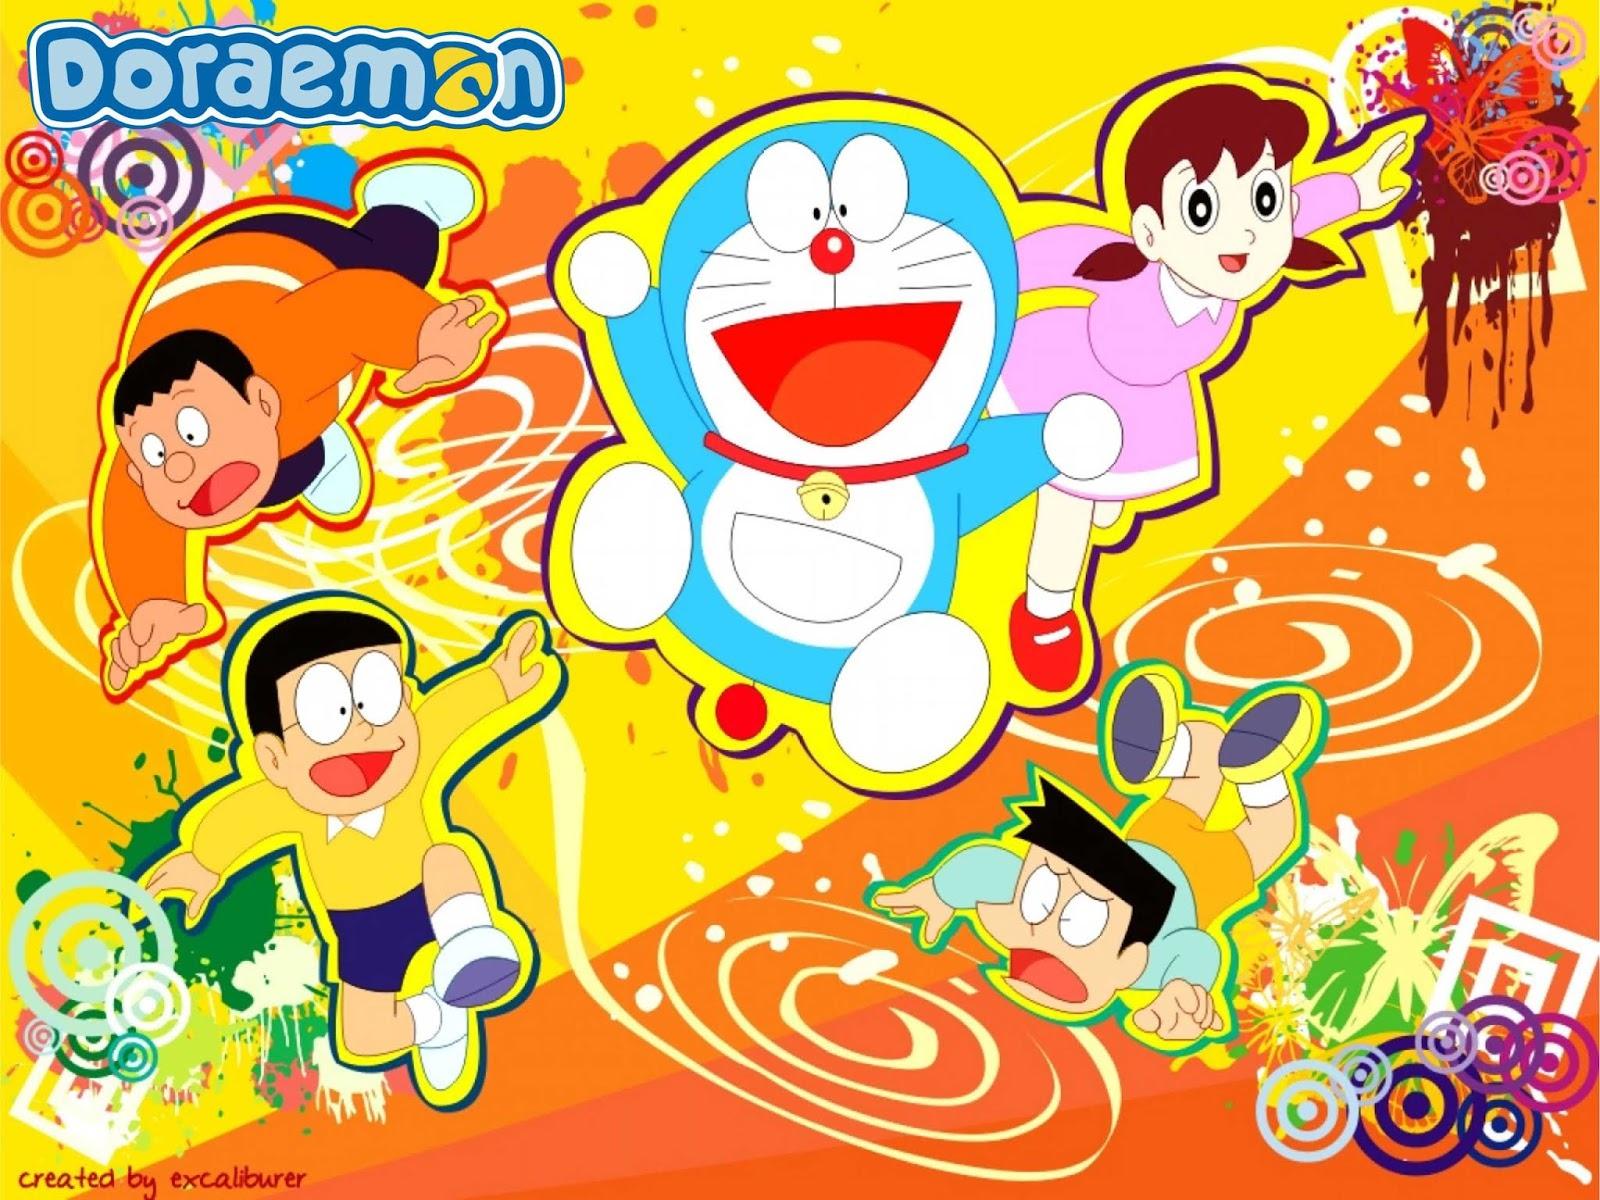 54 Gambar Kartun Doraemon Lucu Dan Imut Terbaru 2020 Gambar Lucu